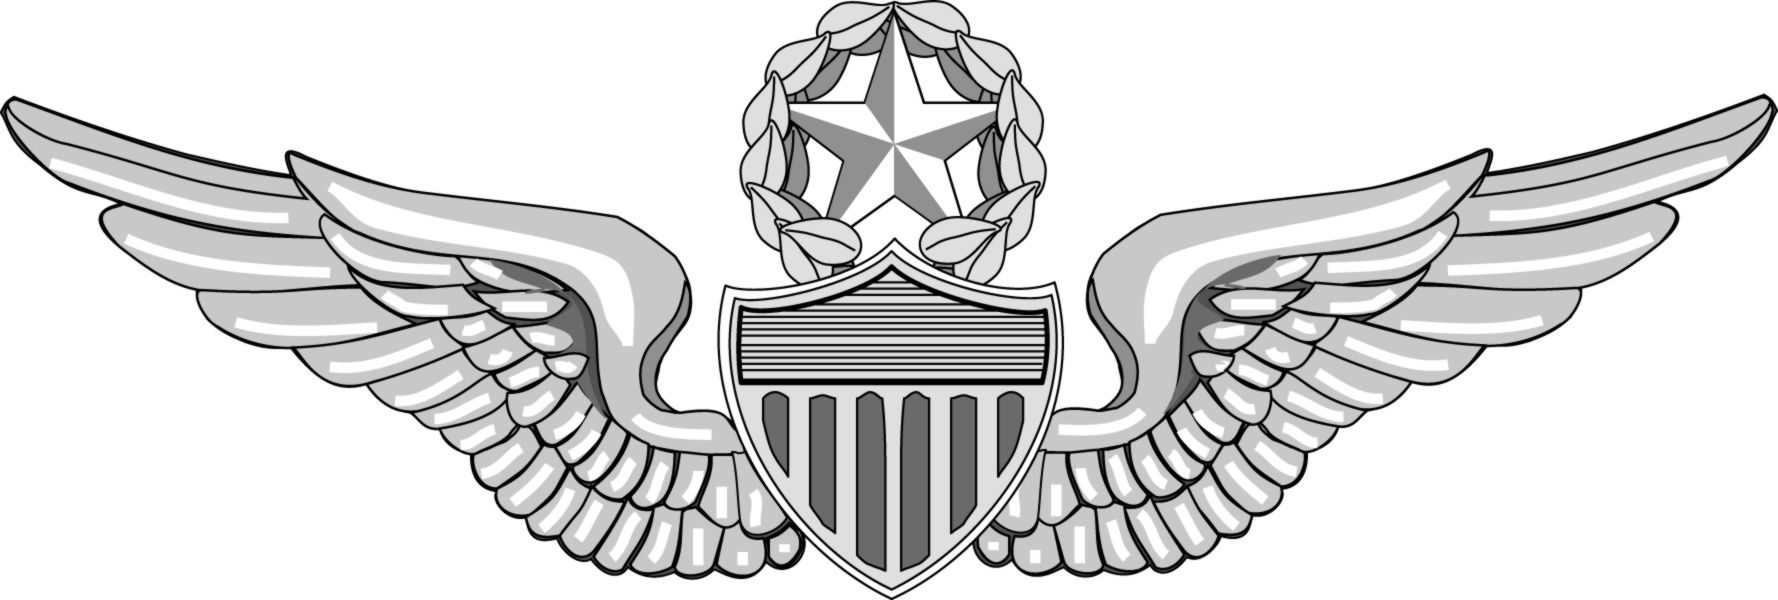 U.S. Army Clip Art - Qualification Badges